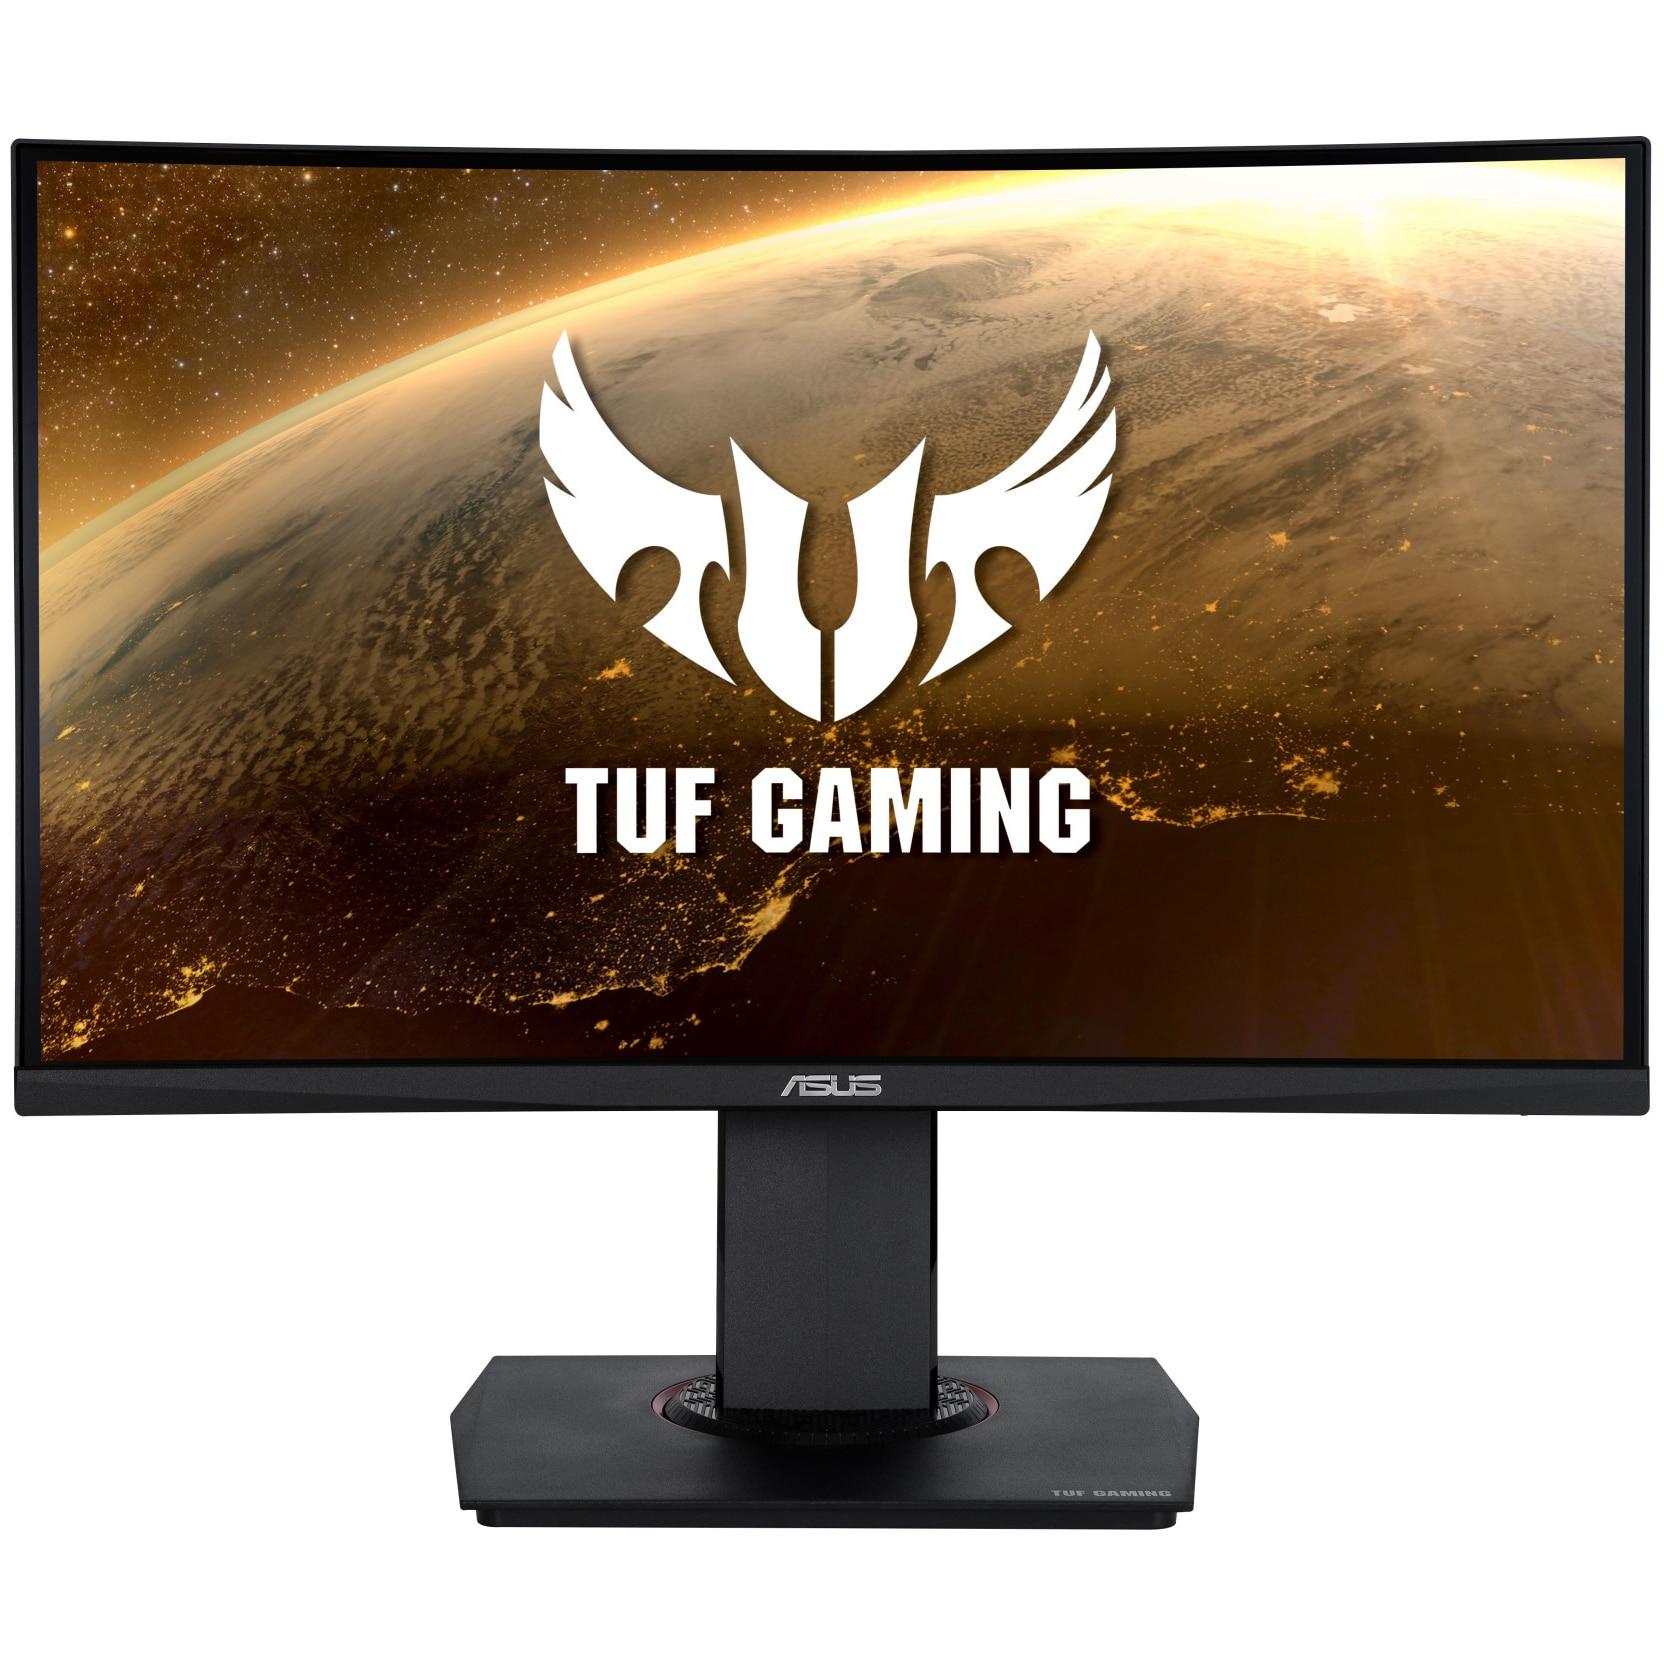 "Fotografie Monitor Curbat Gaming LED VA Asus TUF 23.6"", 144Hz, 1ms, Full HD, Display Port, FreeSync, Negru, Pivot, VG24VQ"